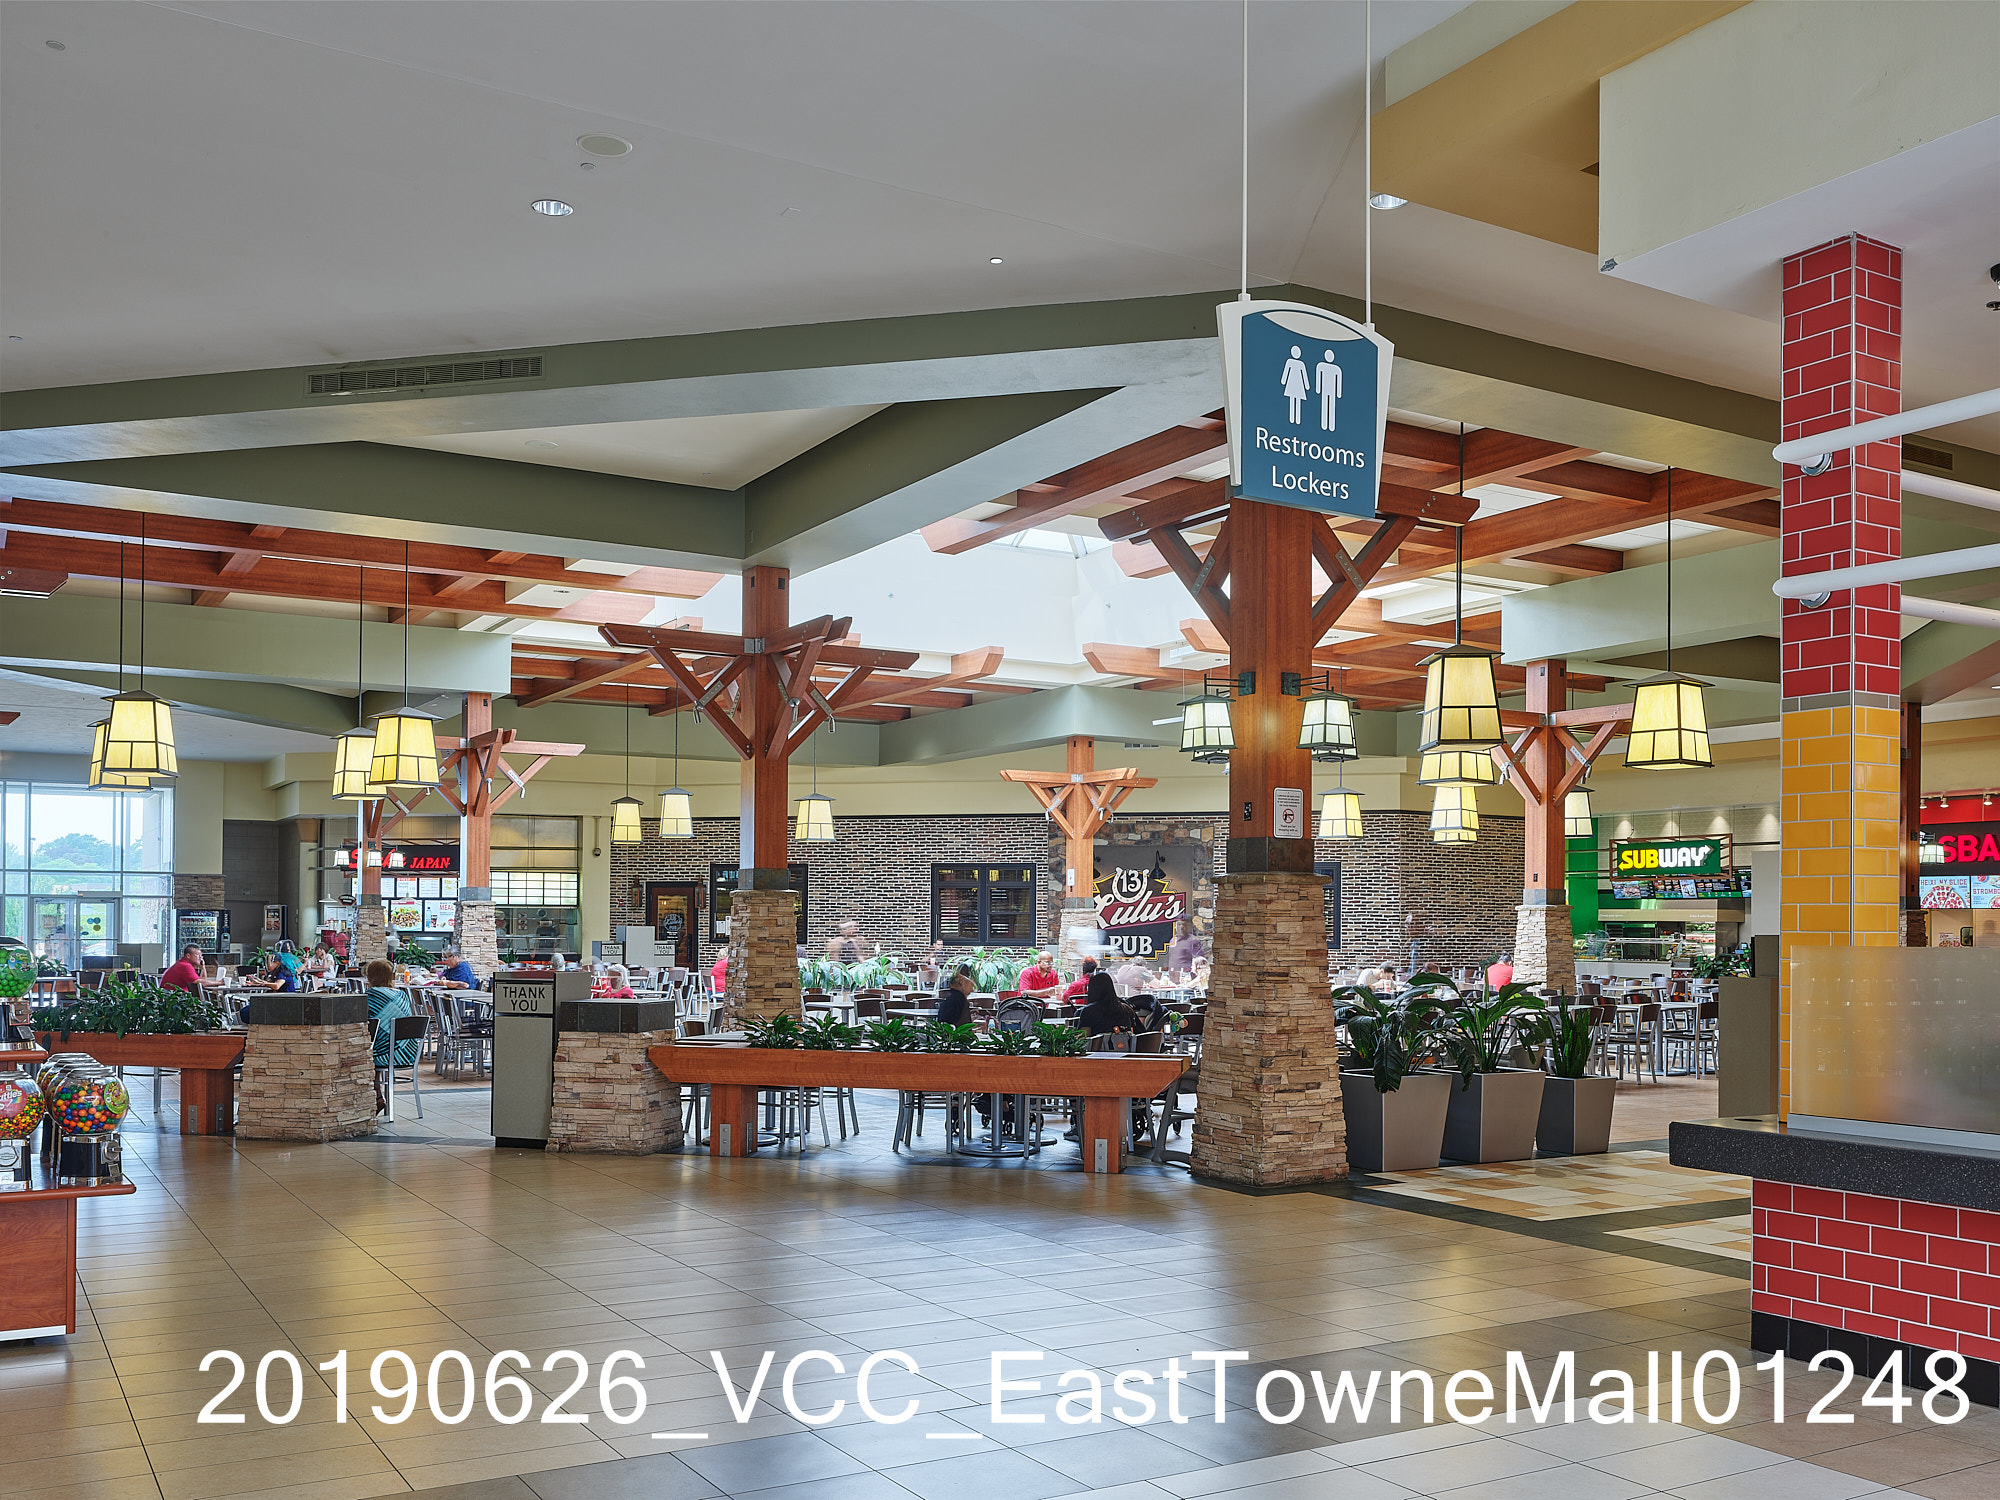 20190626_VCC_EastTowneMall01248.jpg